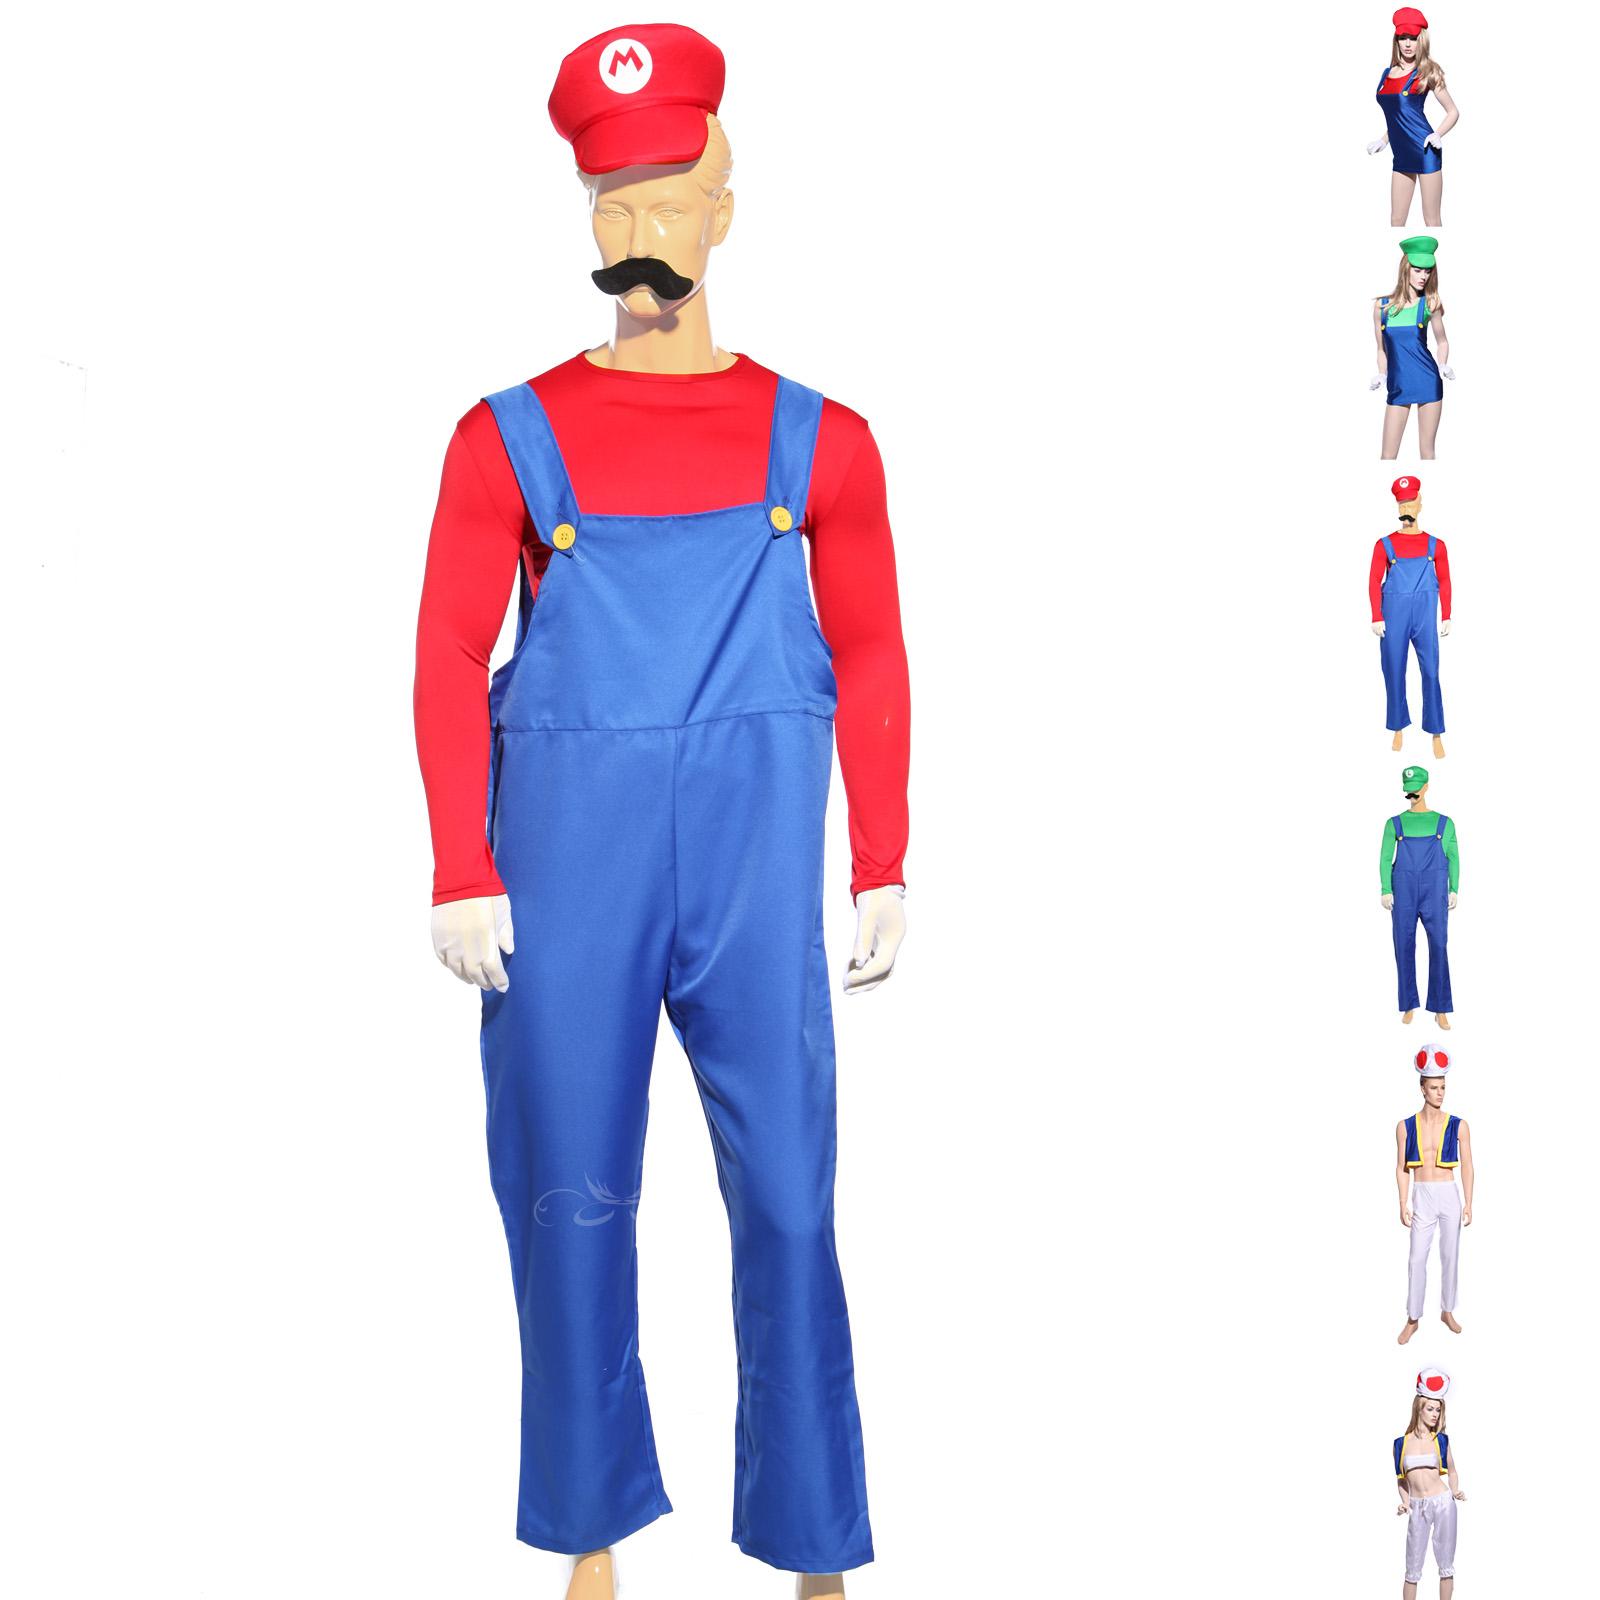 deguisement costume game jeu plumbier mario luigi toad frere homme femme s m l. Black Bedroom Furniture Sets. Home Design Ideas